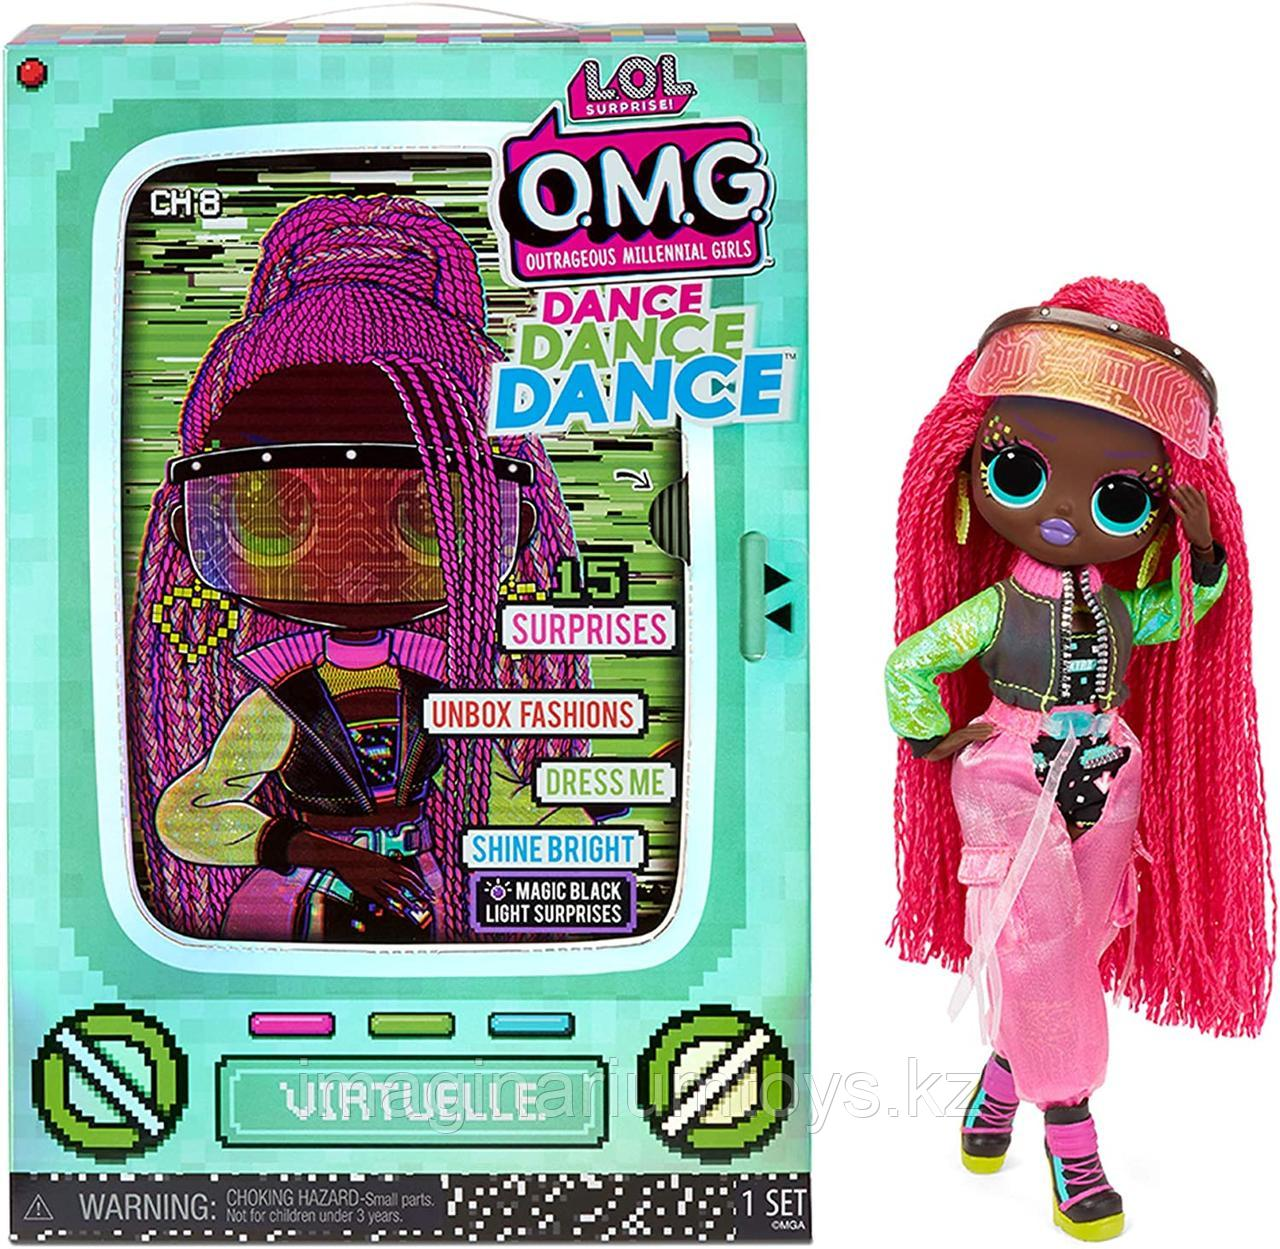 Кукла ЛОЛ ОМГ Танцы LOL Surprise OMG Dance Virtuelle